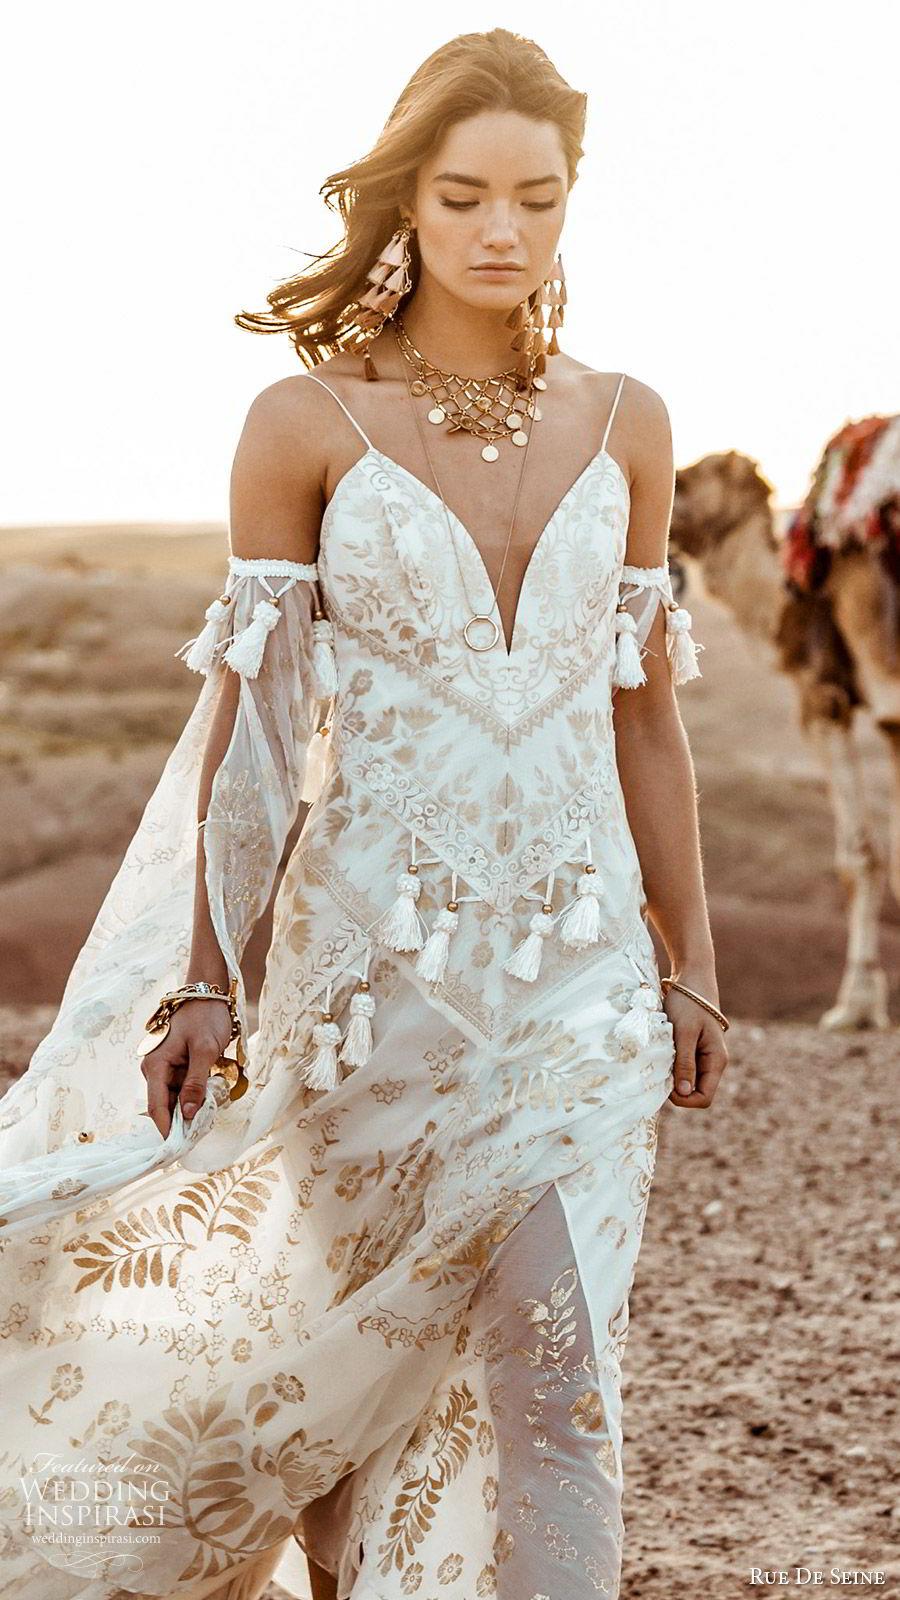 rue de seine 2019 bridal sleeveless thin straps detached long split sleeves sweetheart neckline modified a line wedding dress (8) boho chic romantic gold chapel train mv